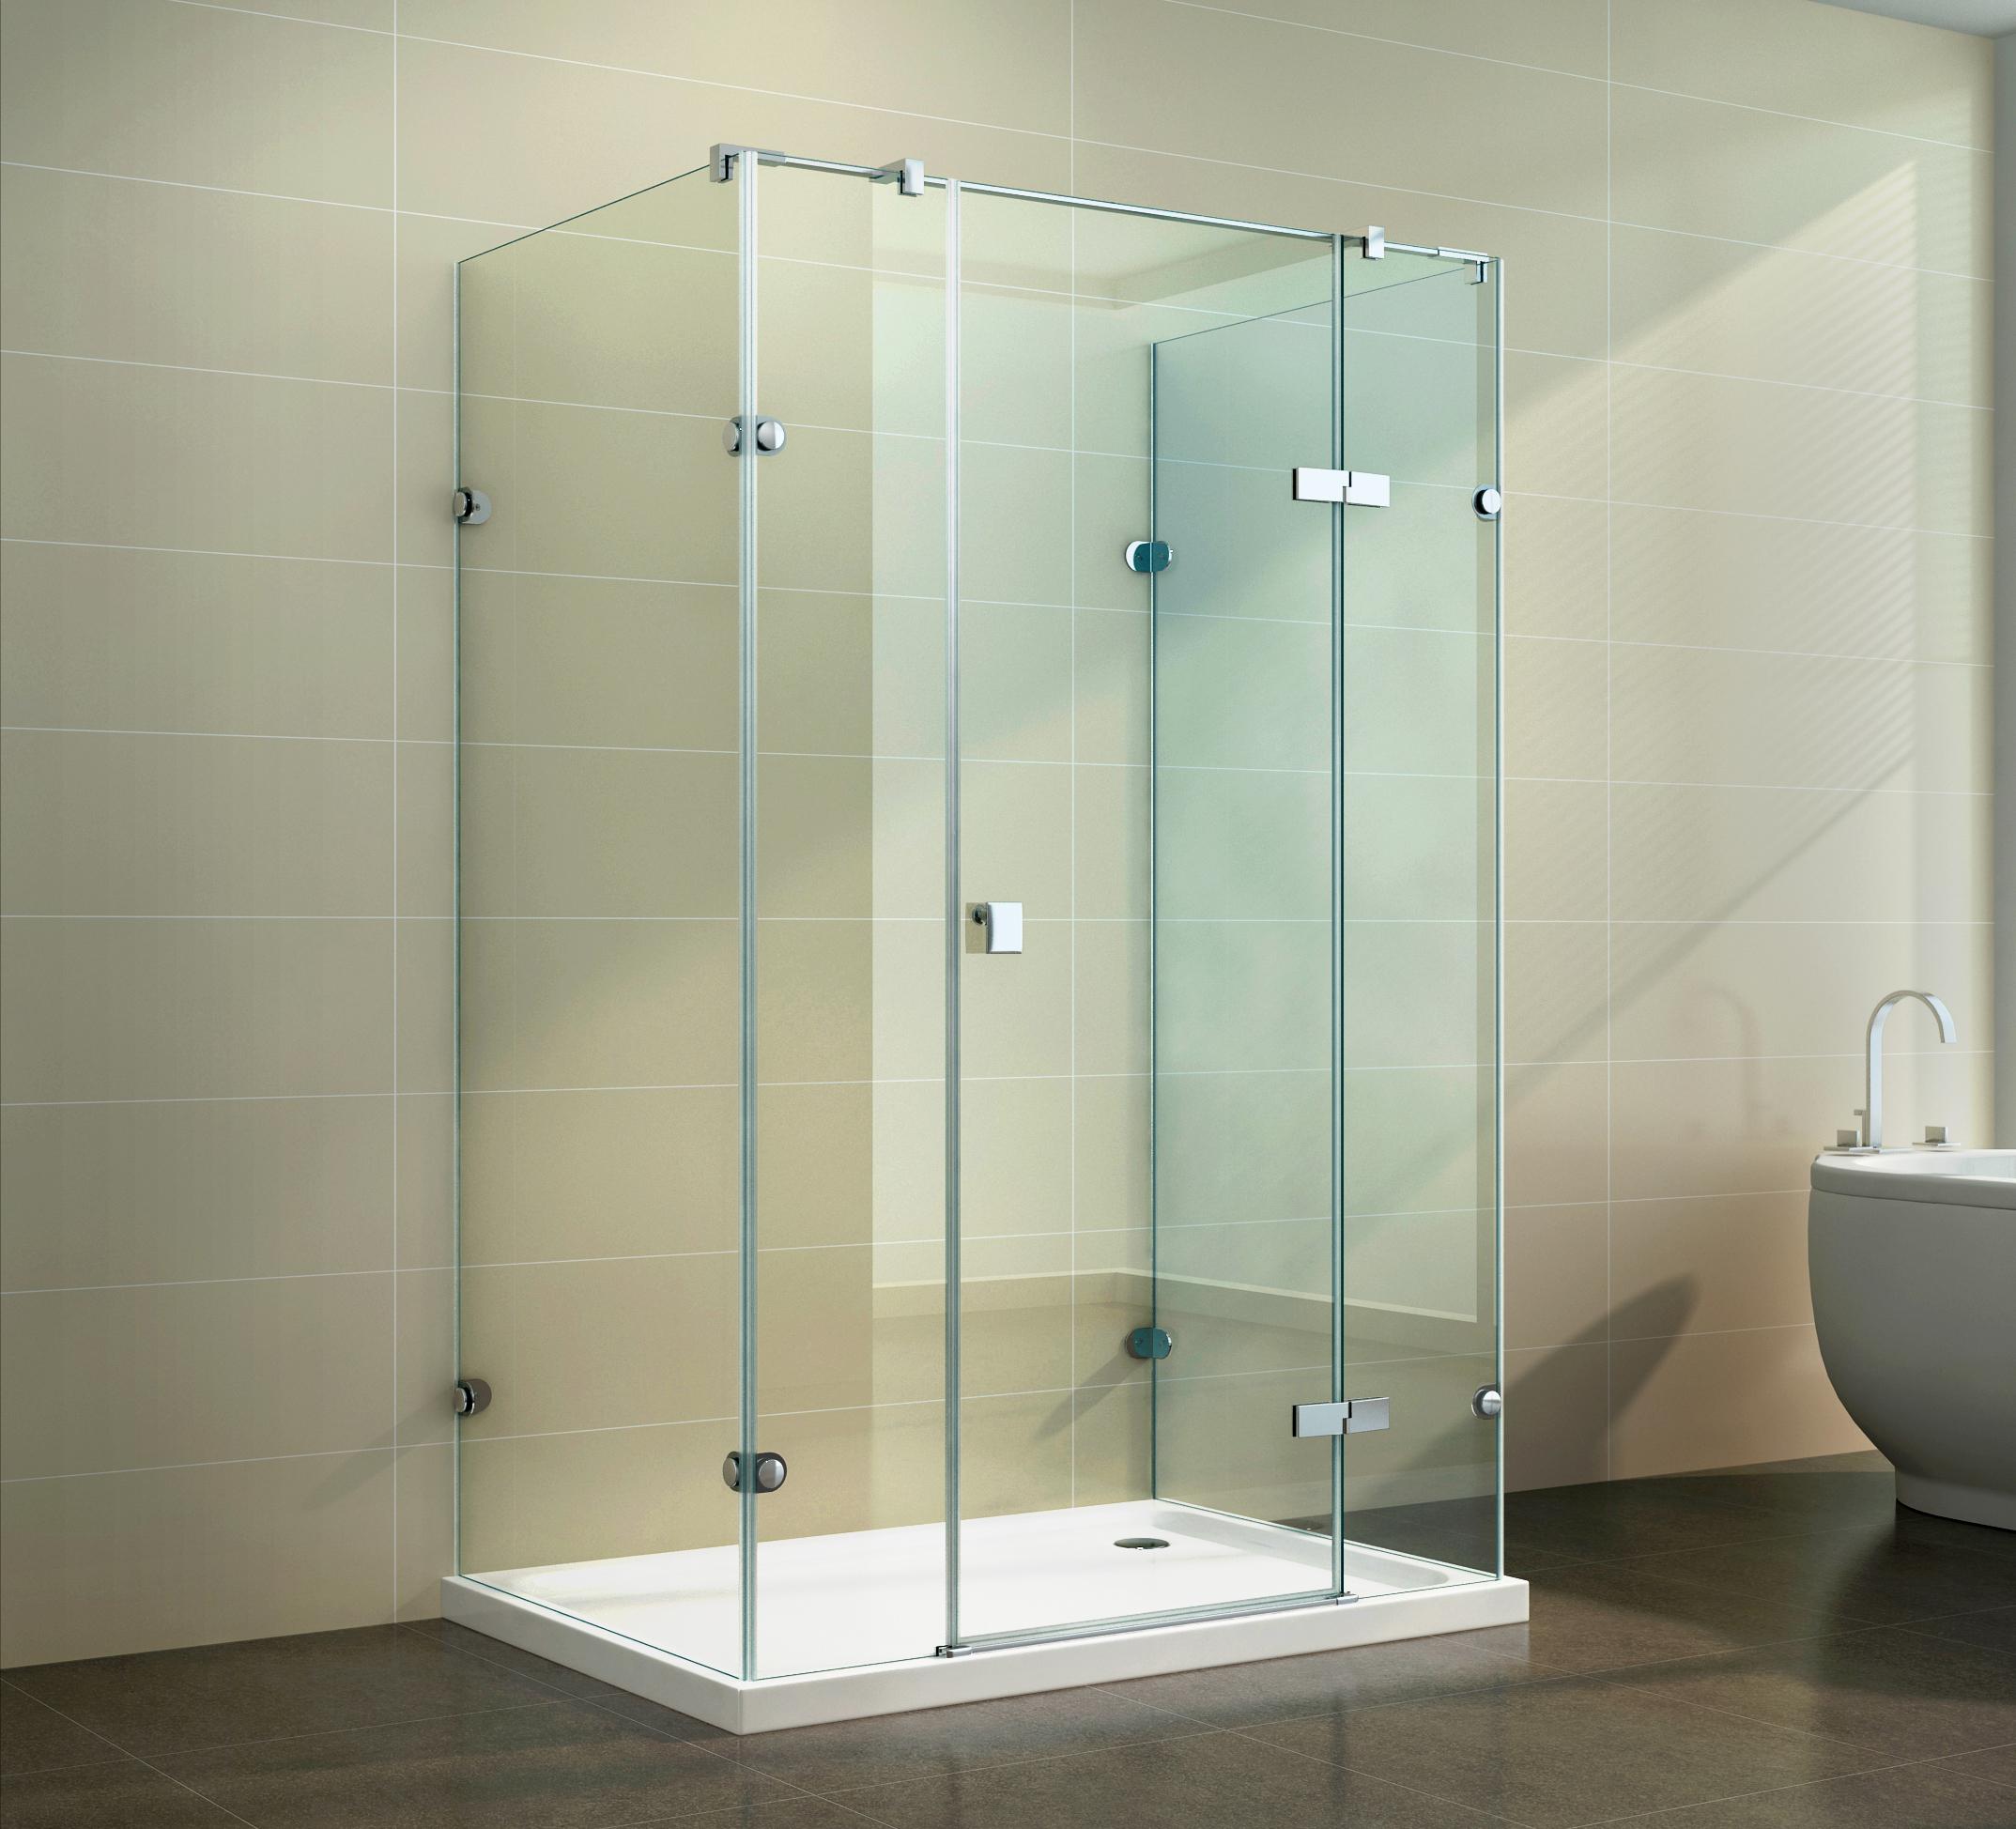 duschkabine dusche u form u duschabtrennung 8mm esg nano beschichtung ebay. Black Bedroom Furniture Sets. Home Design Ideas